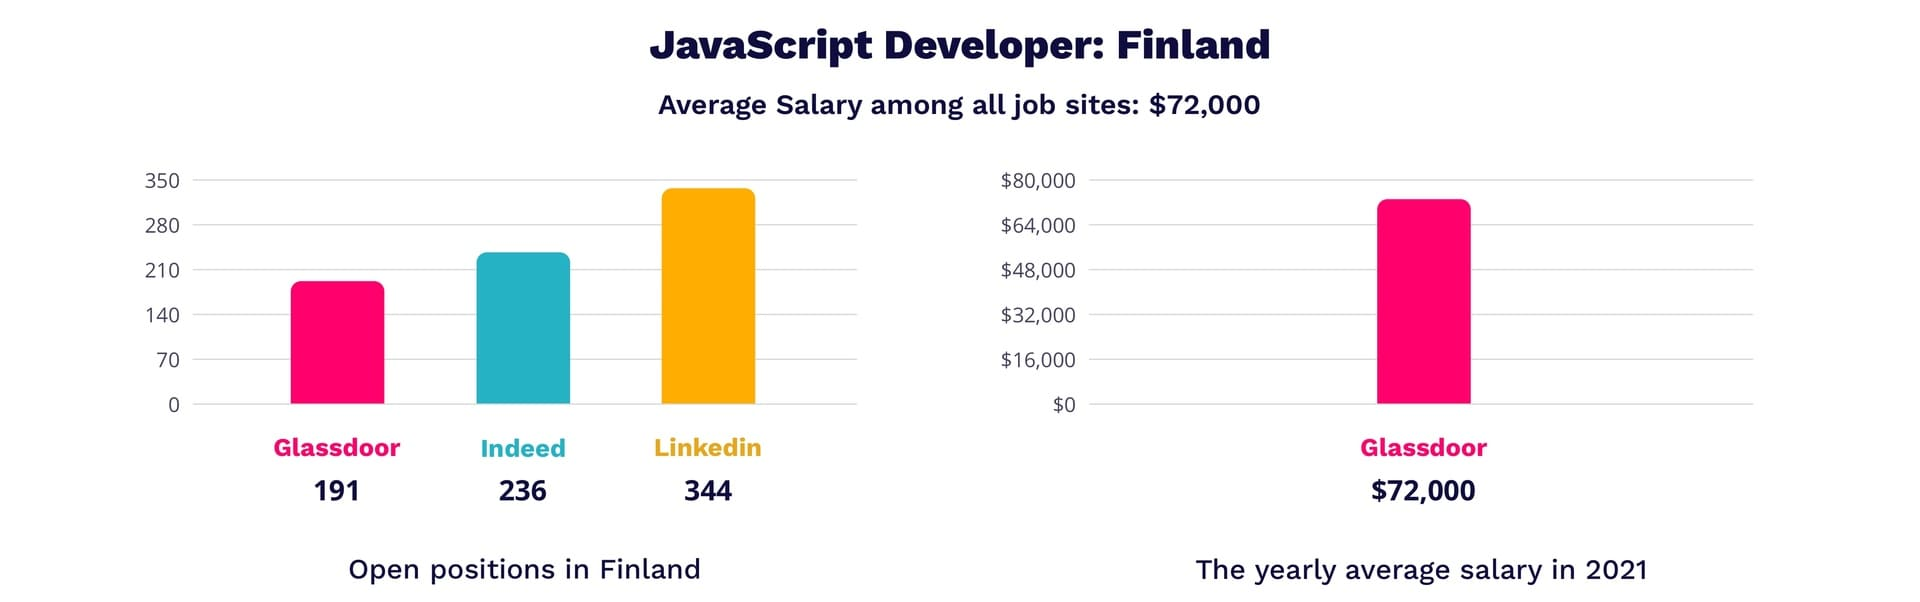 JavaScript developer salary in Finland